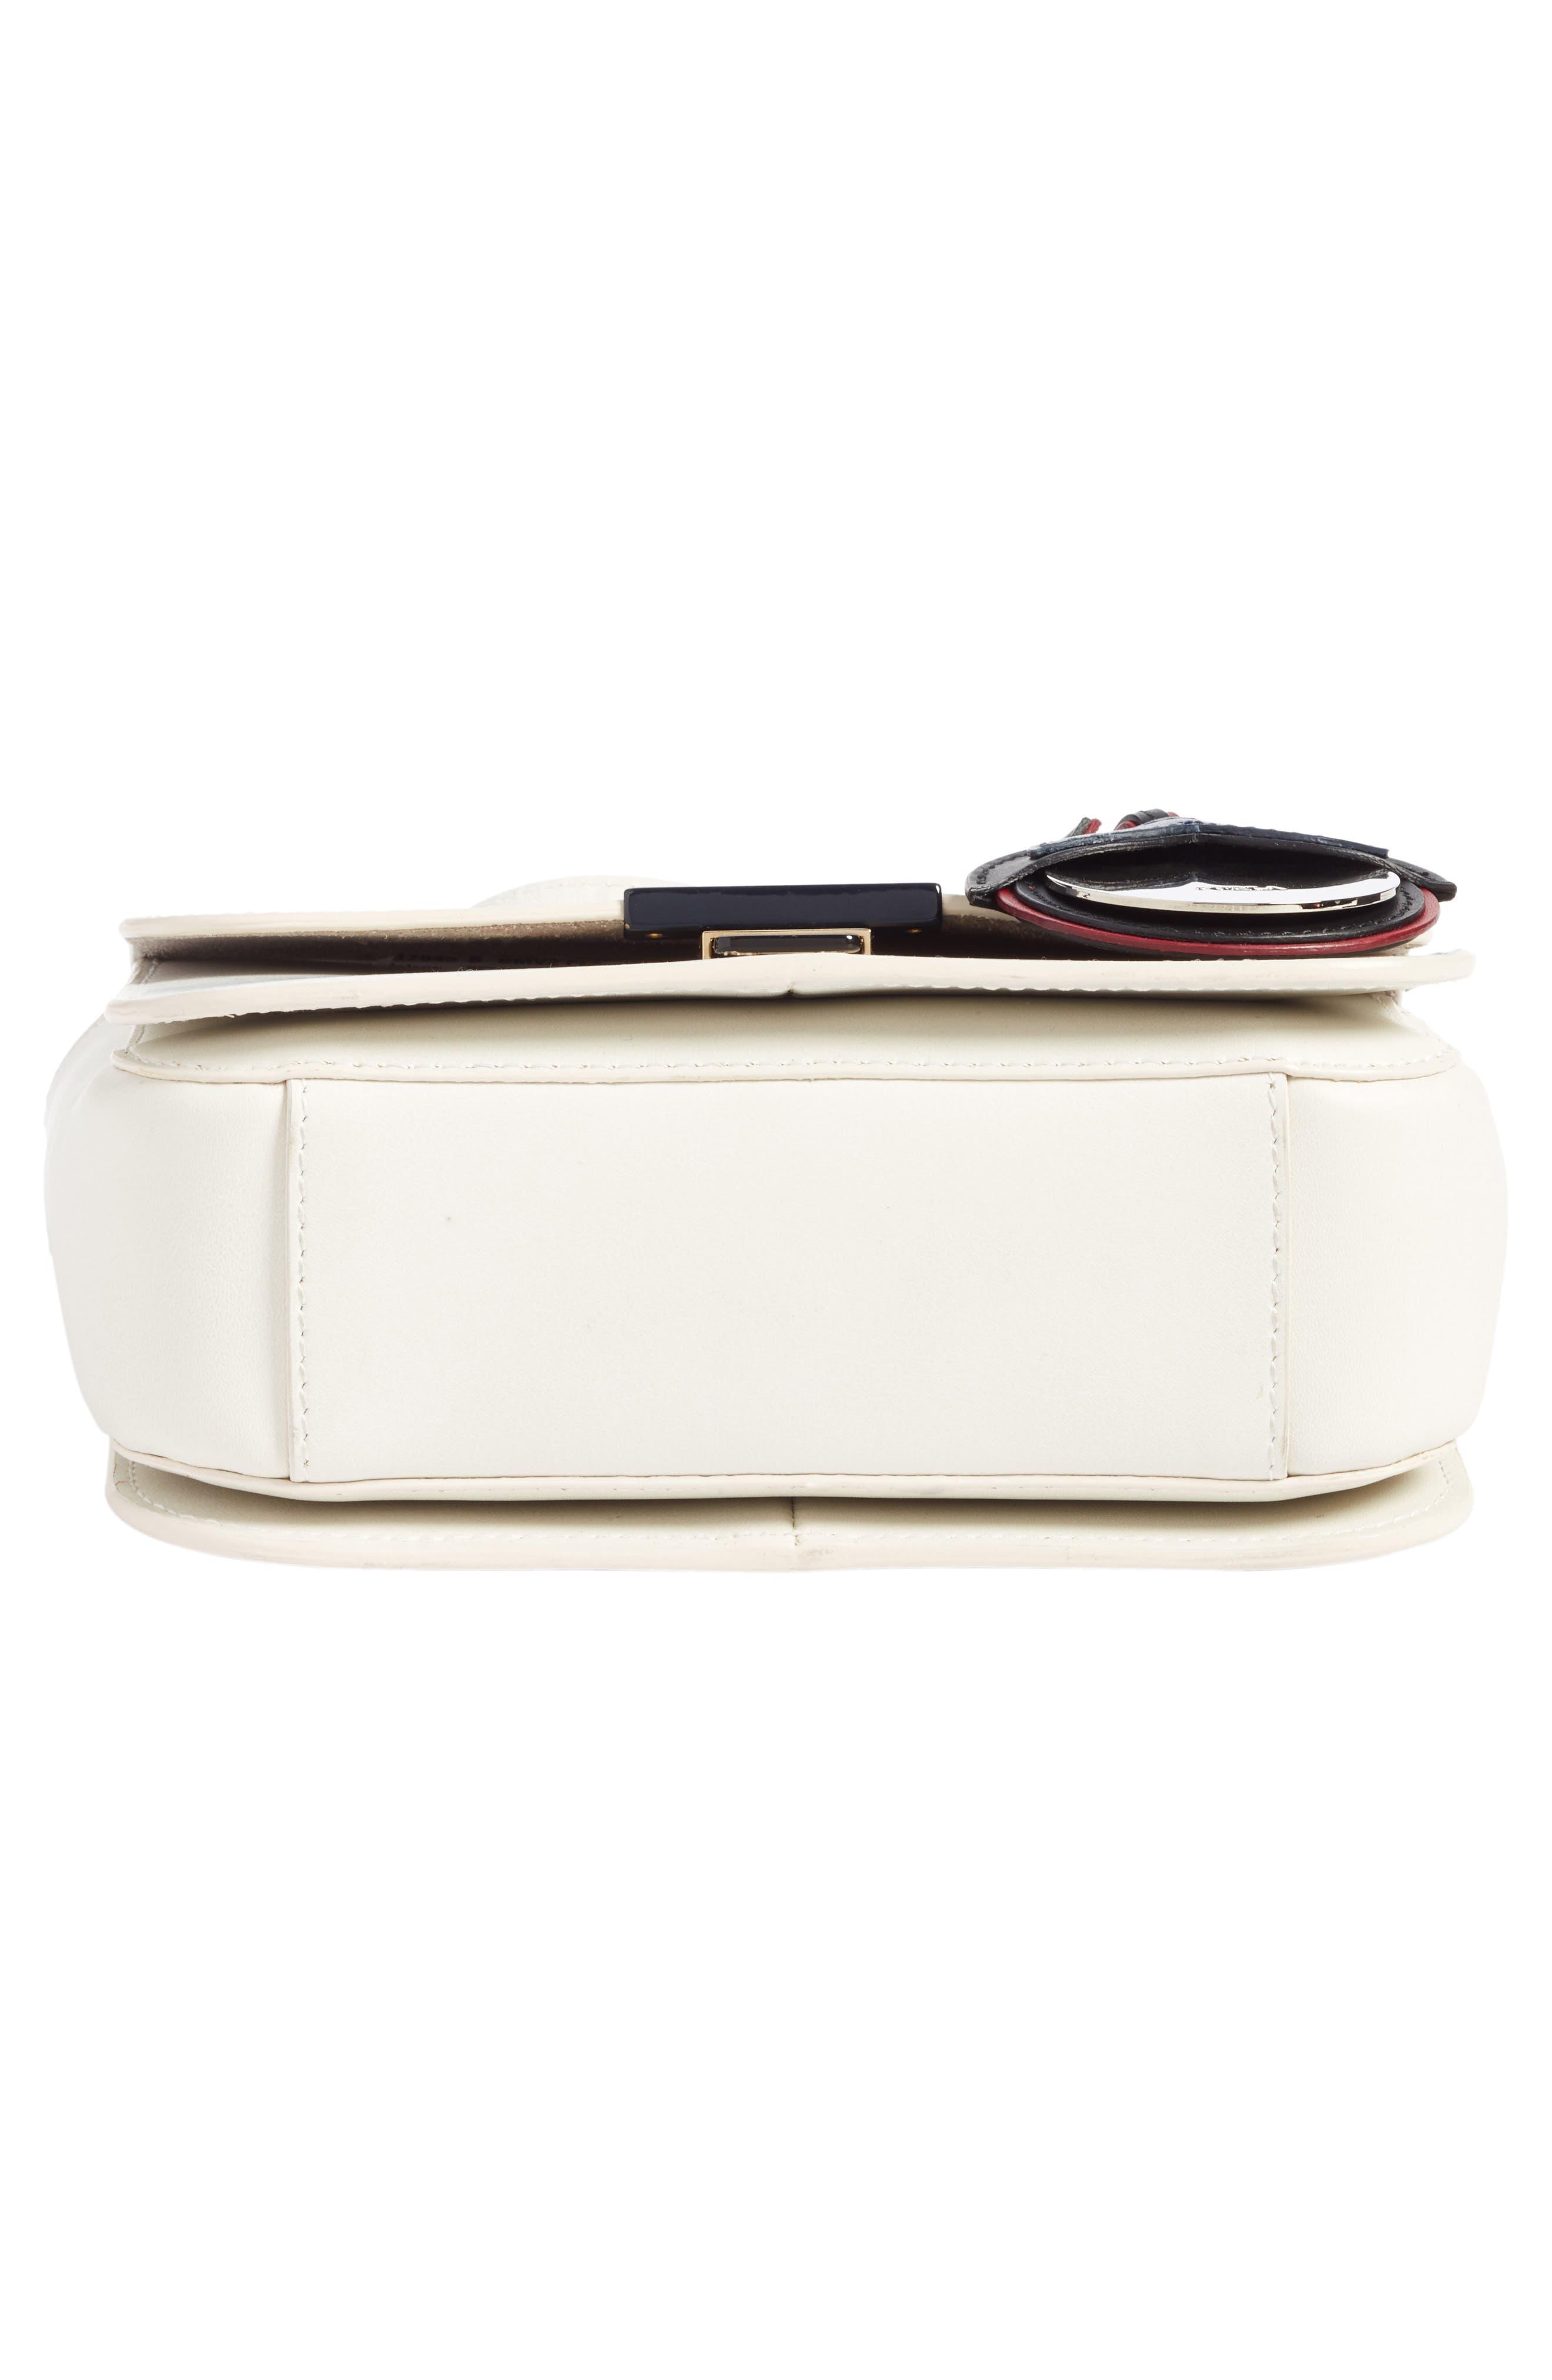 Elisir Mini Crossbody Bag,                             Alternate thumbnail 6, color,                             Petalo